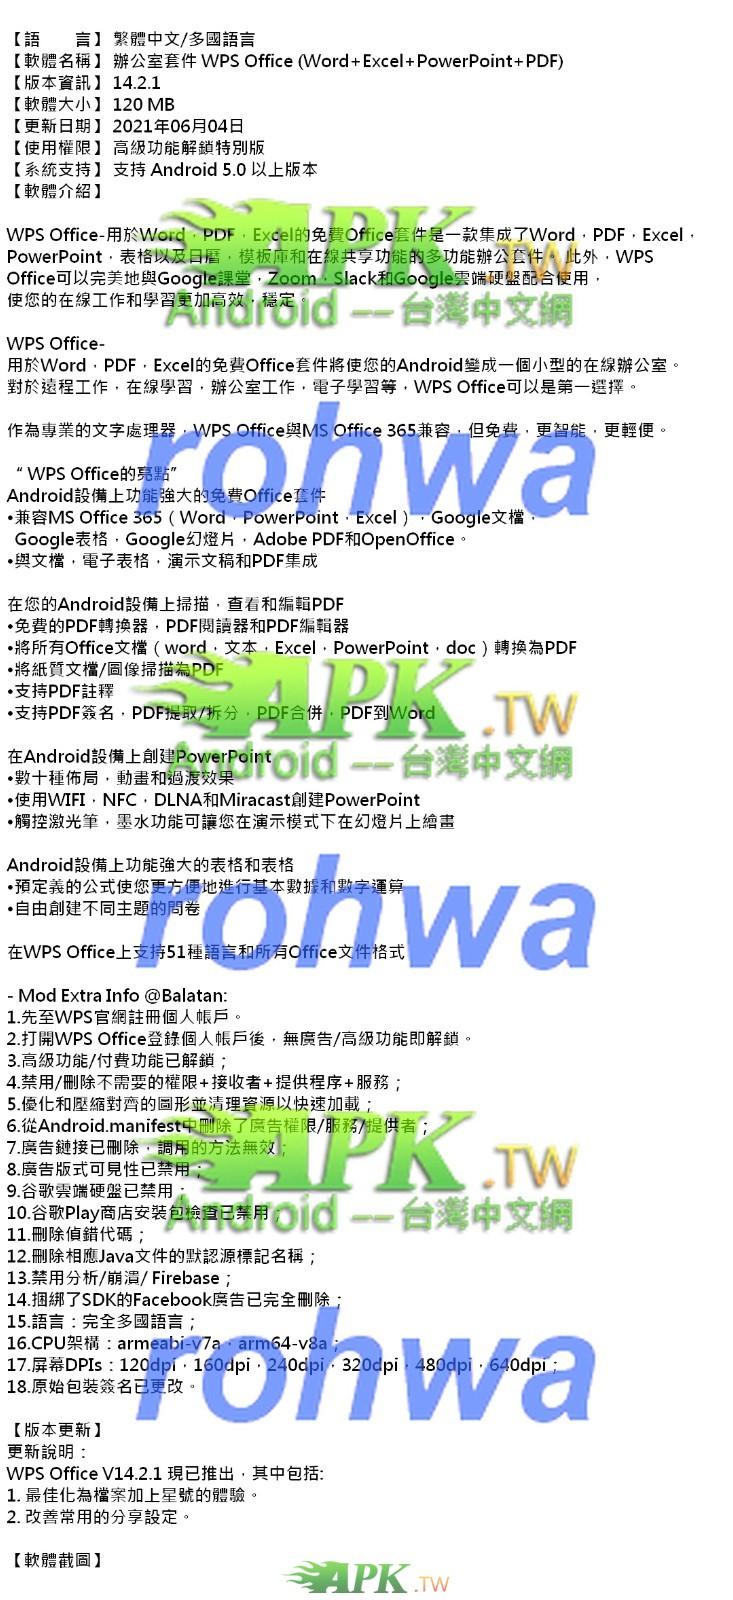 WPS_Office_Premium_14.2.1 APK_.jpg